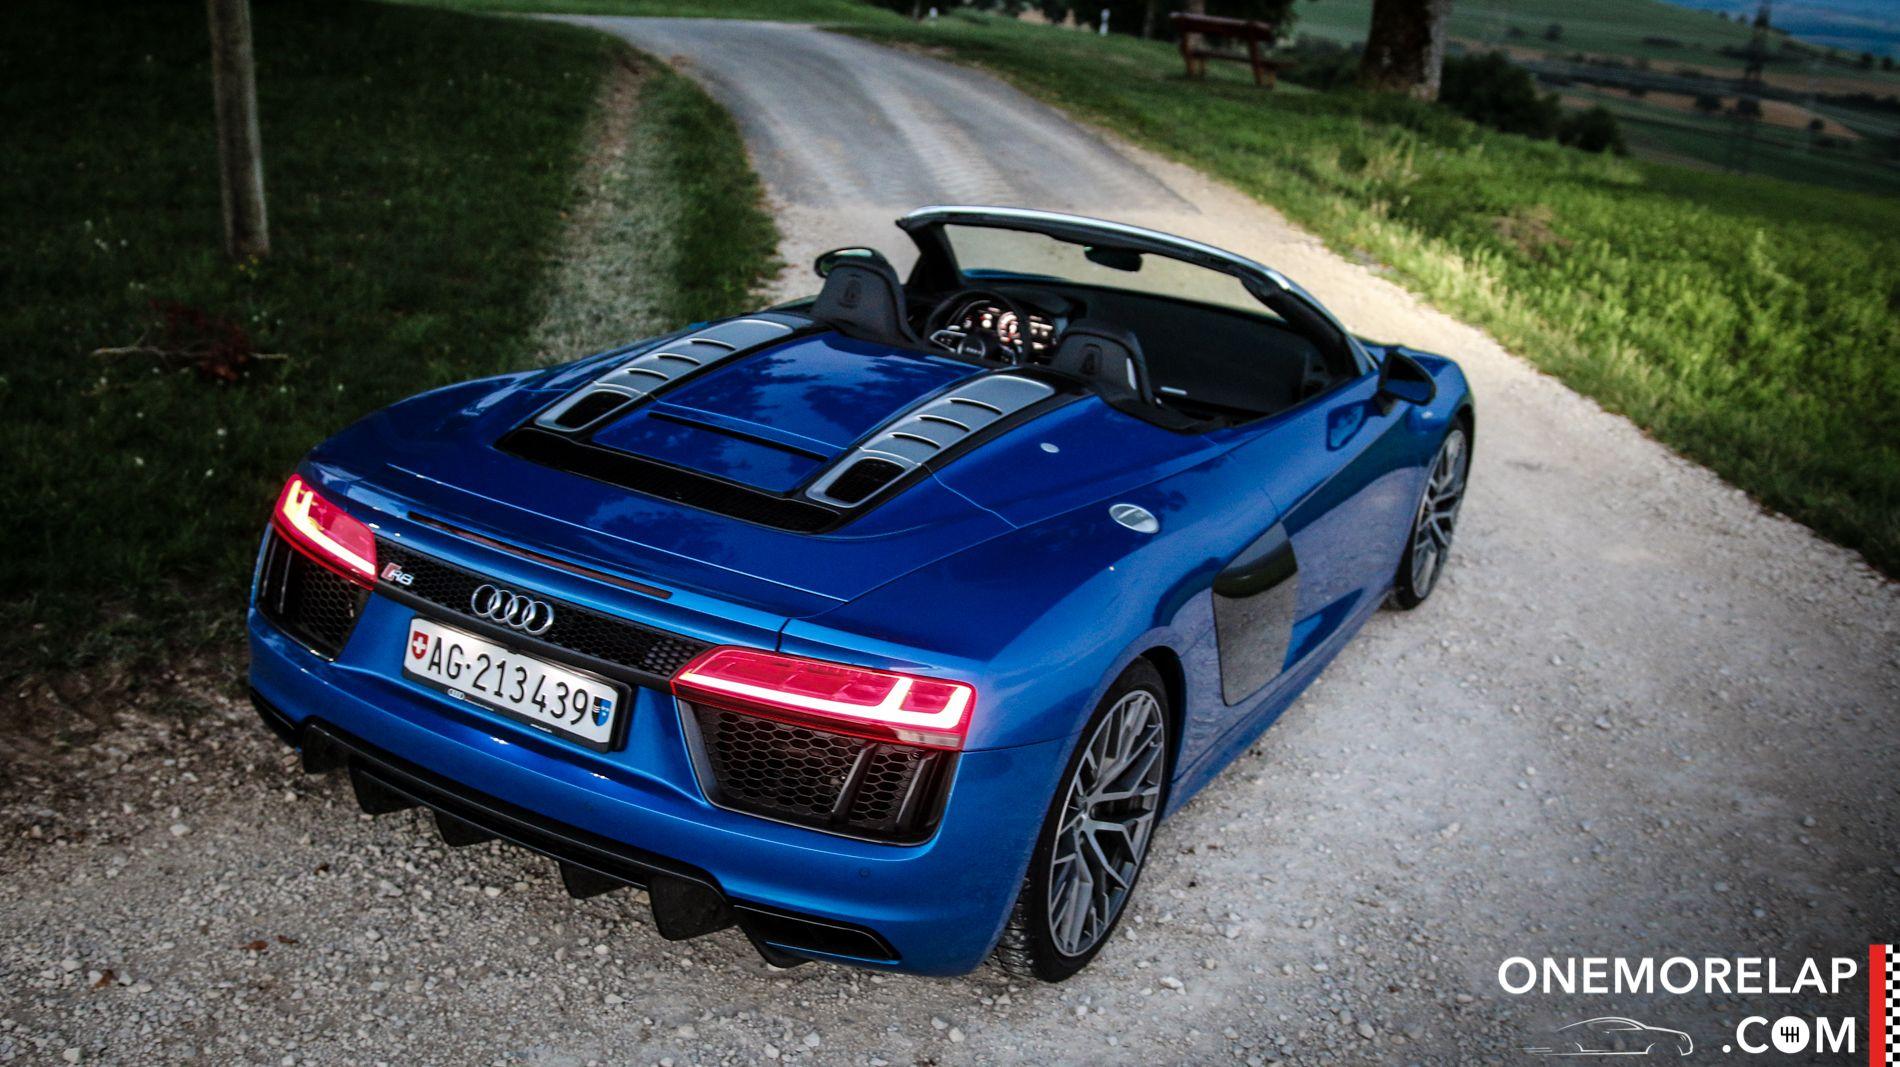 Fahrbericht Audi R8 V10 Spyder Audi R8 V10 Audi R8 Audi